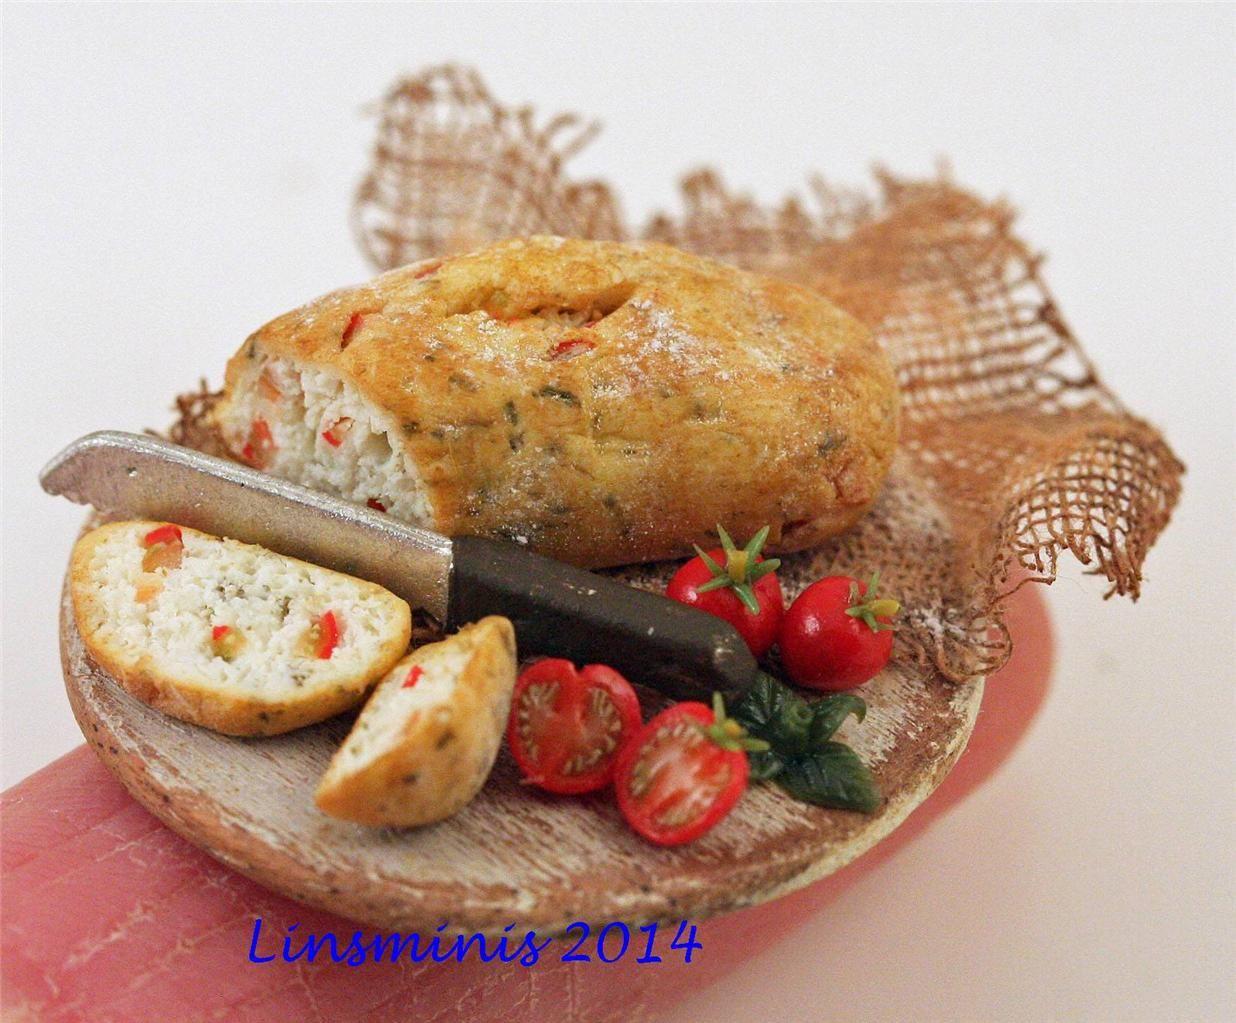 The Mini Food Blog: Tomato Basil Bread ~ Linda Cummings